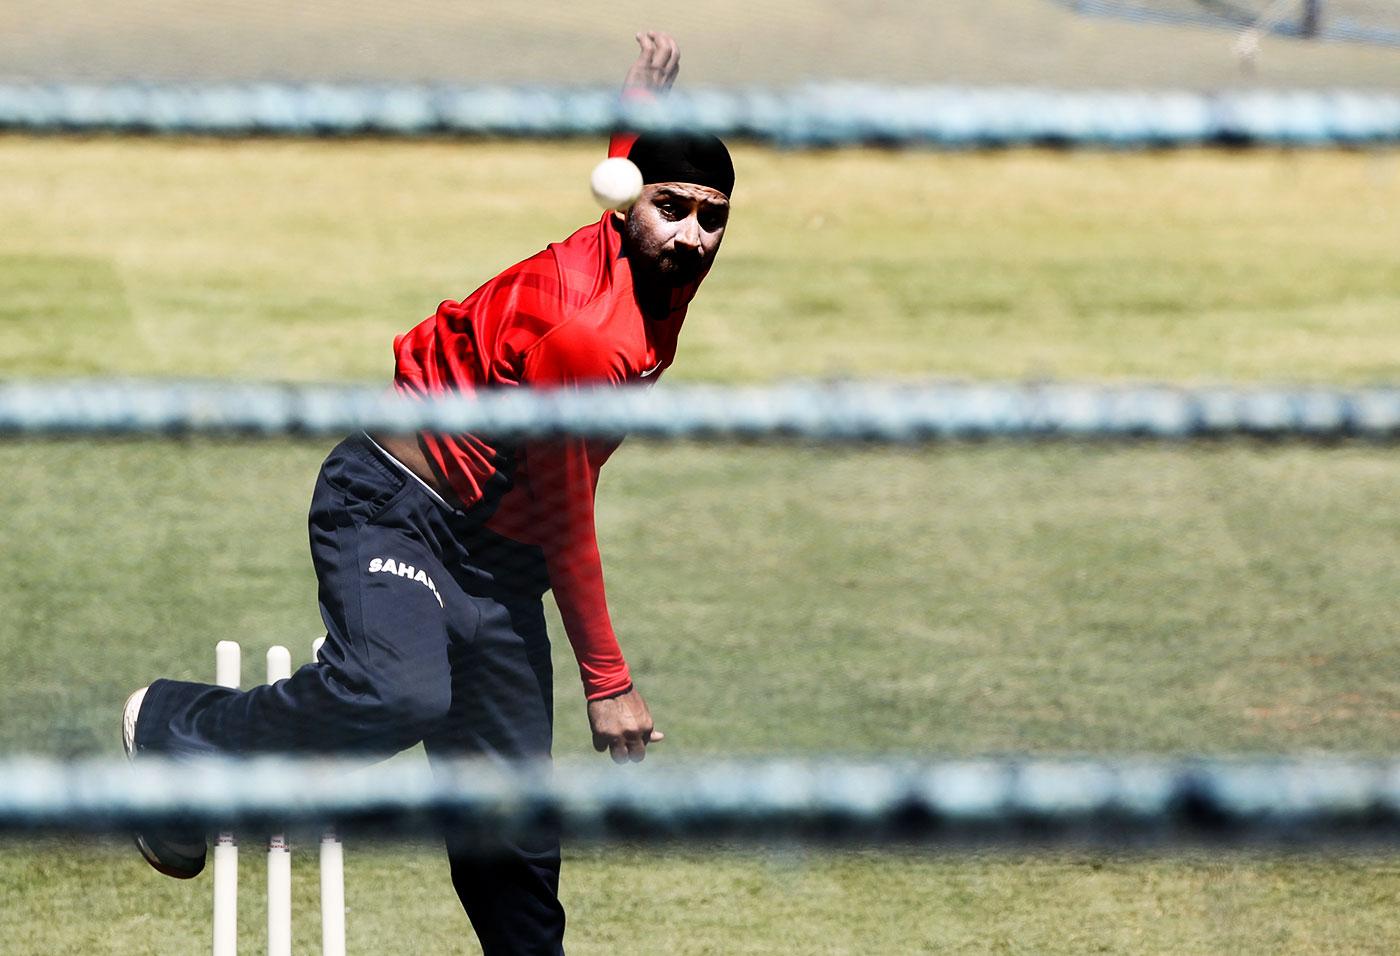 Harbhajan Singh bowls in the nets